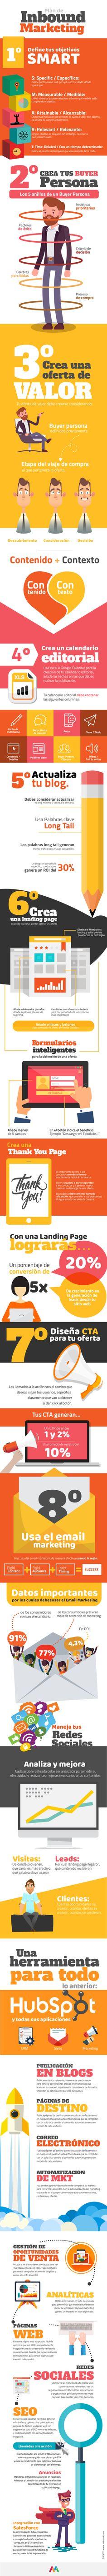 Plan de Inbound Marketing #infografia